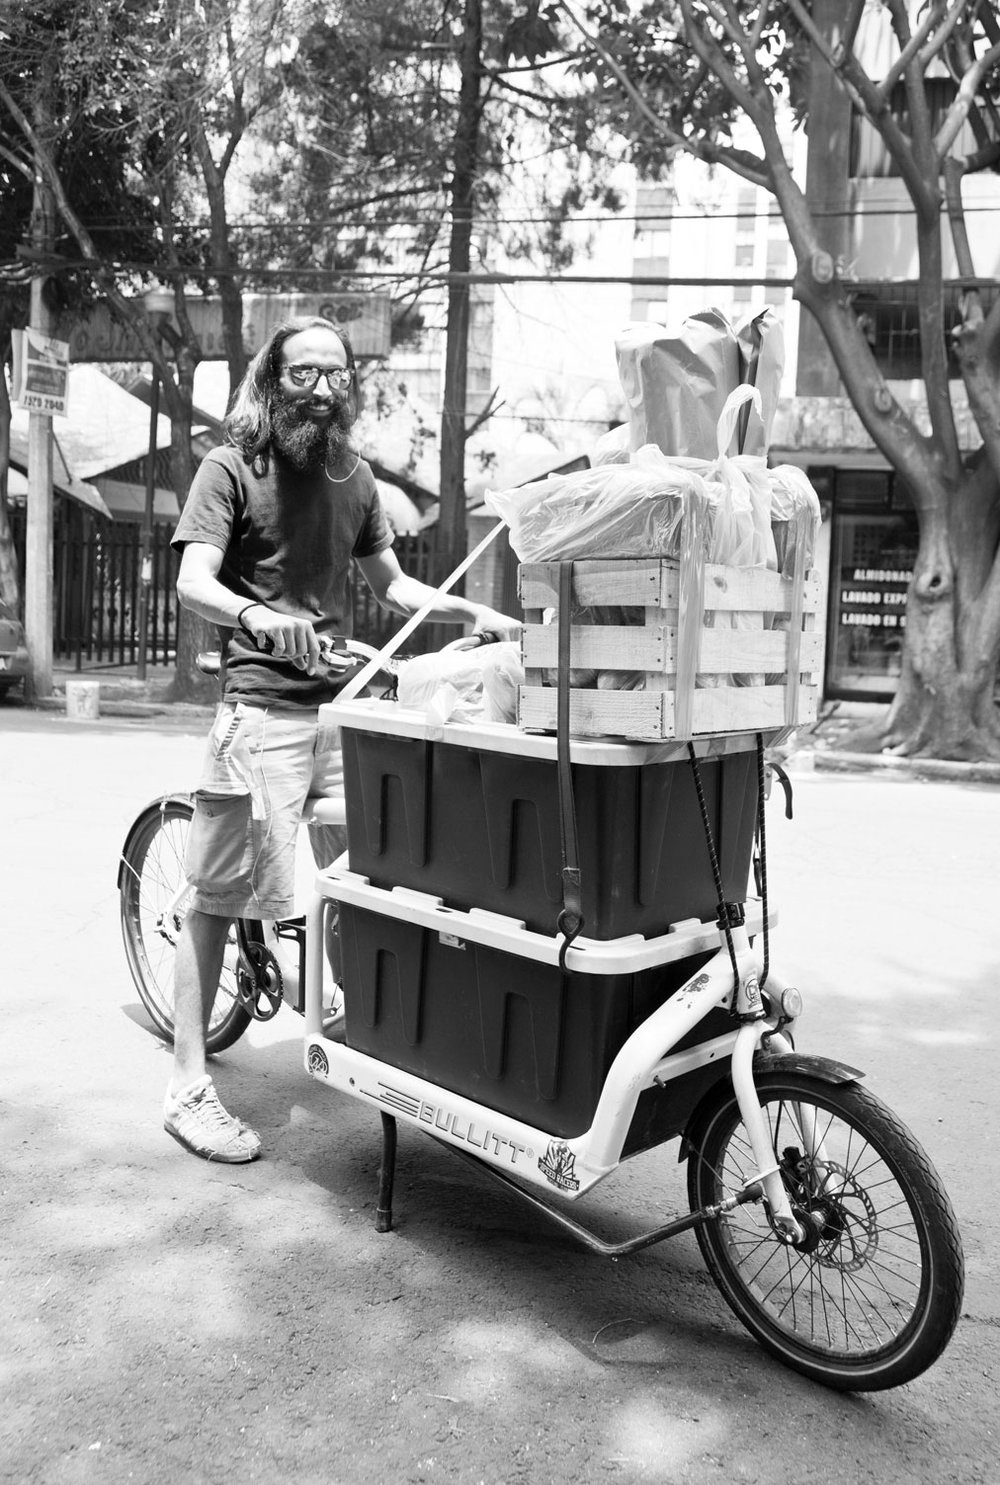 05052018_unaorden-meals+on+wheels+01.jpg